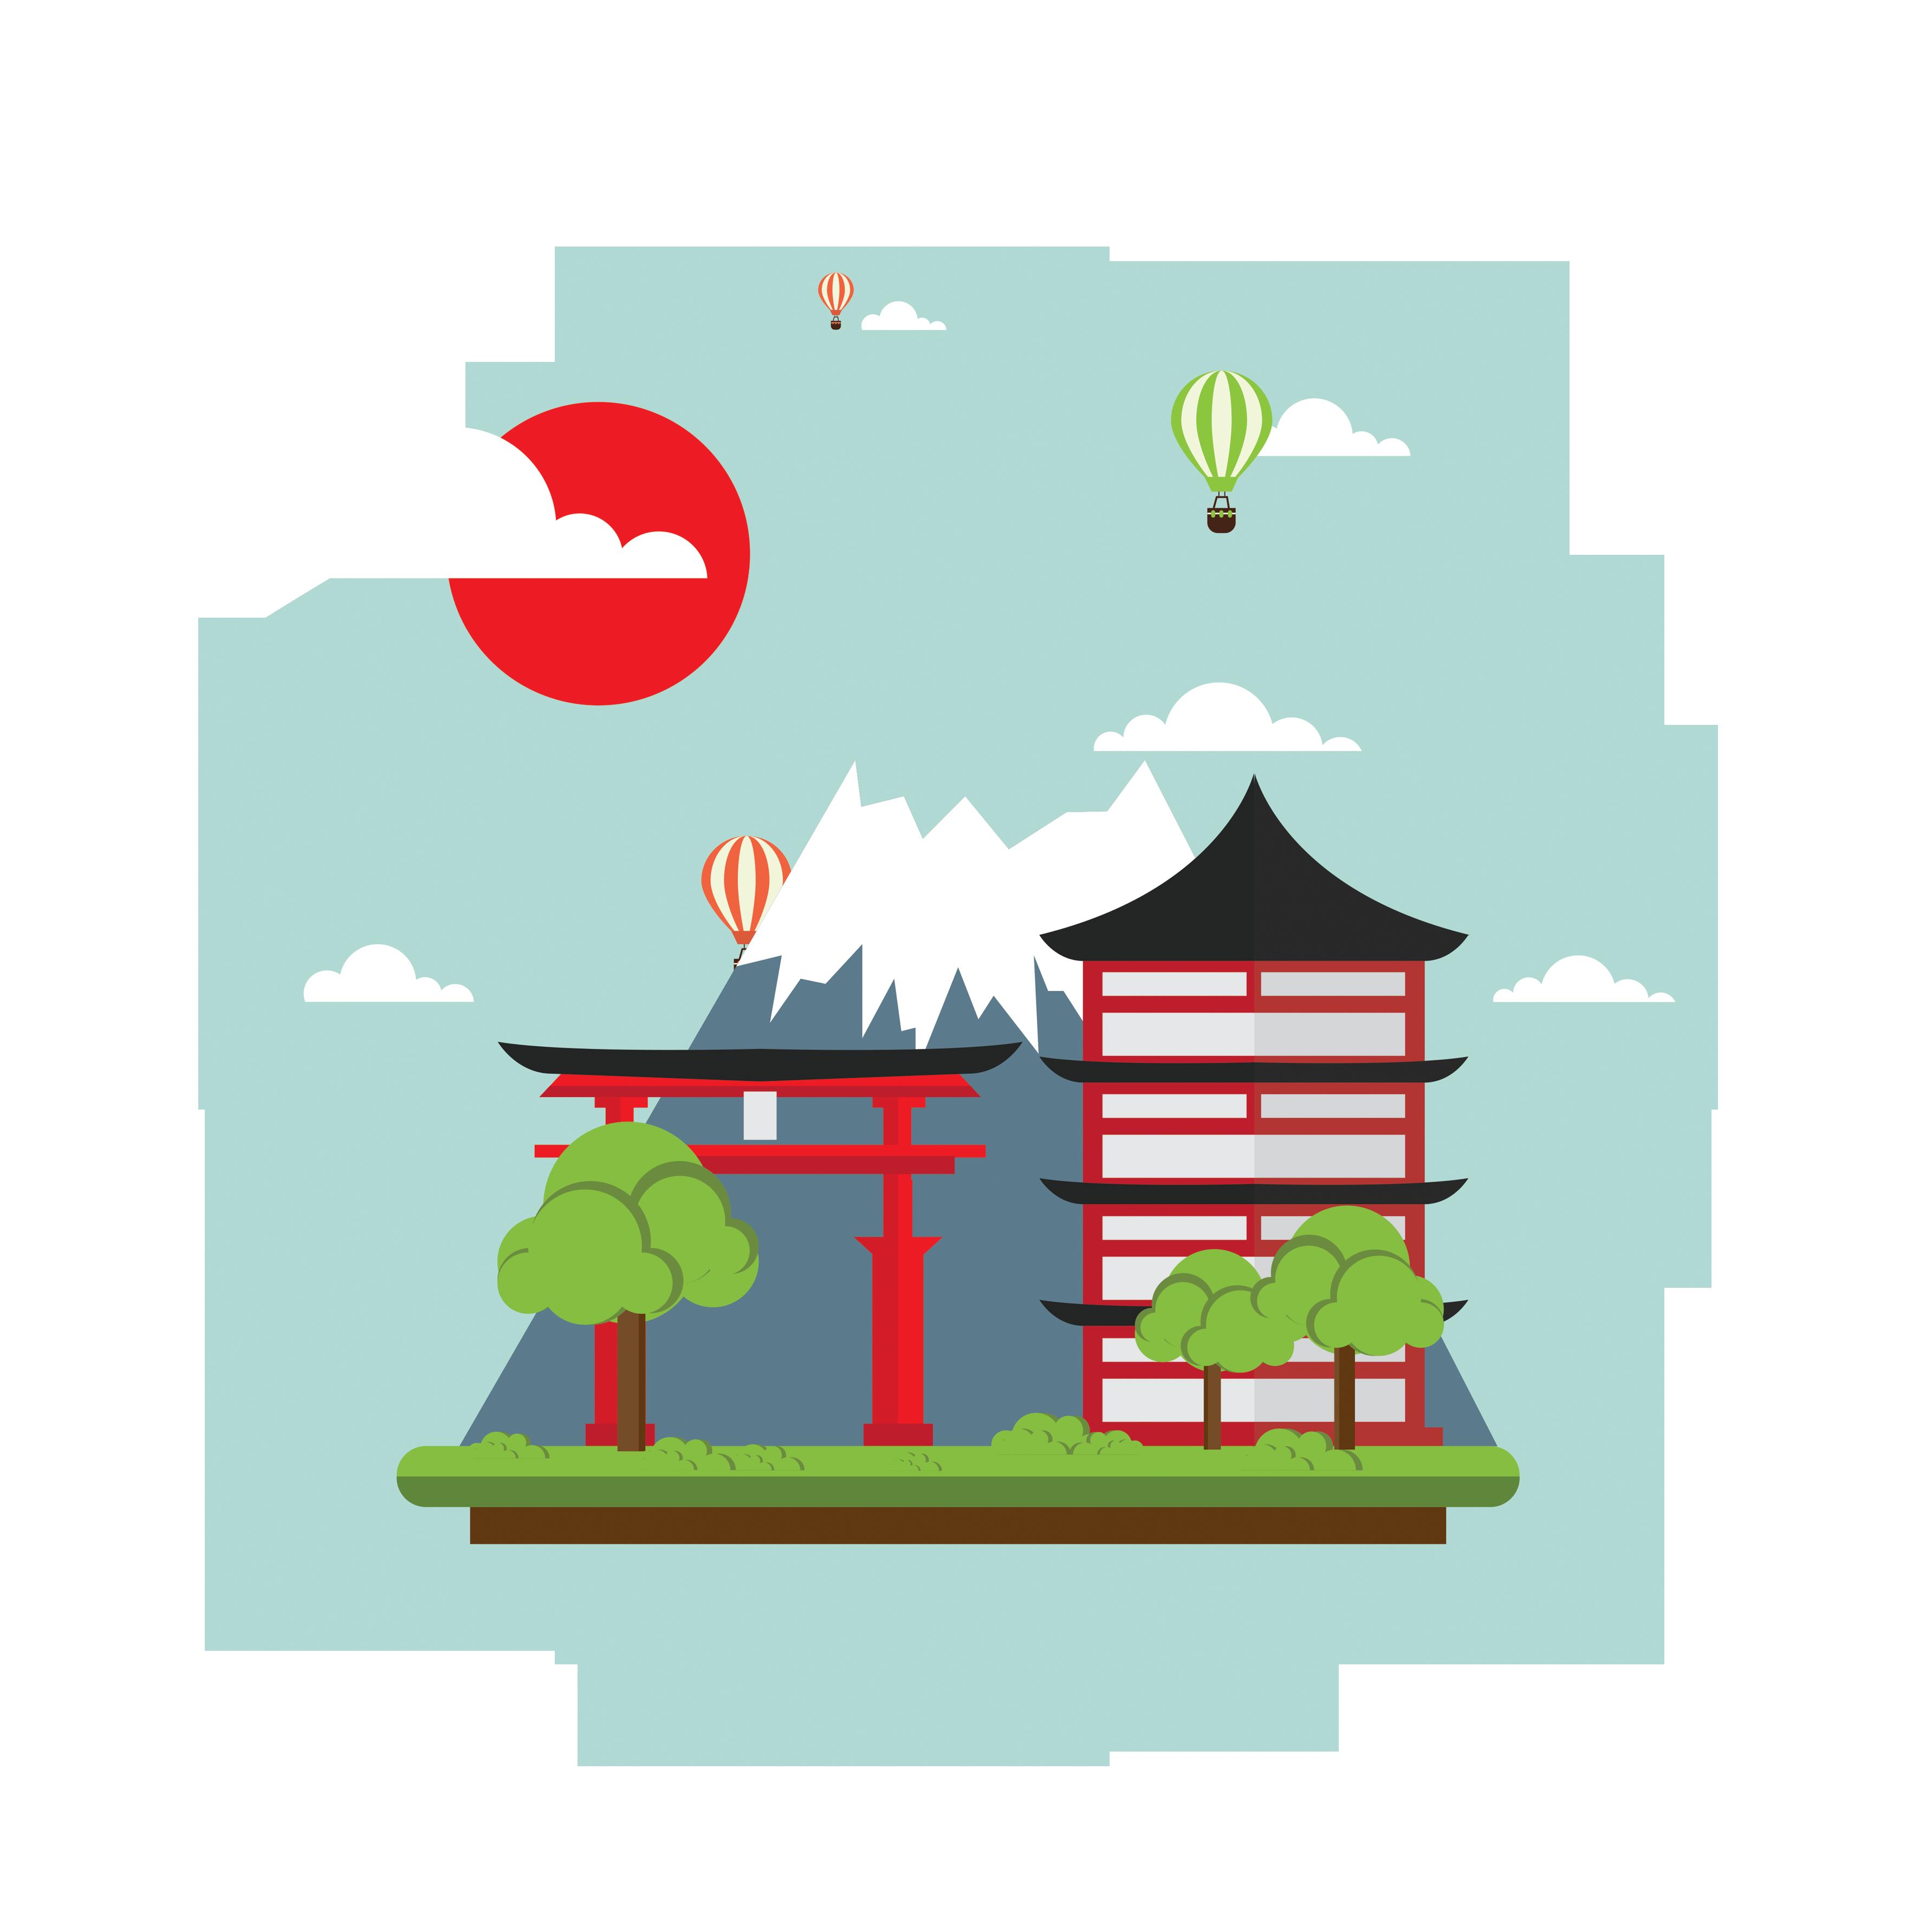 Mount fuji clip art. Clipart castle scenery